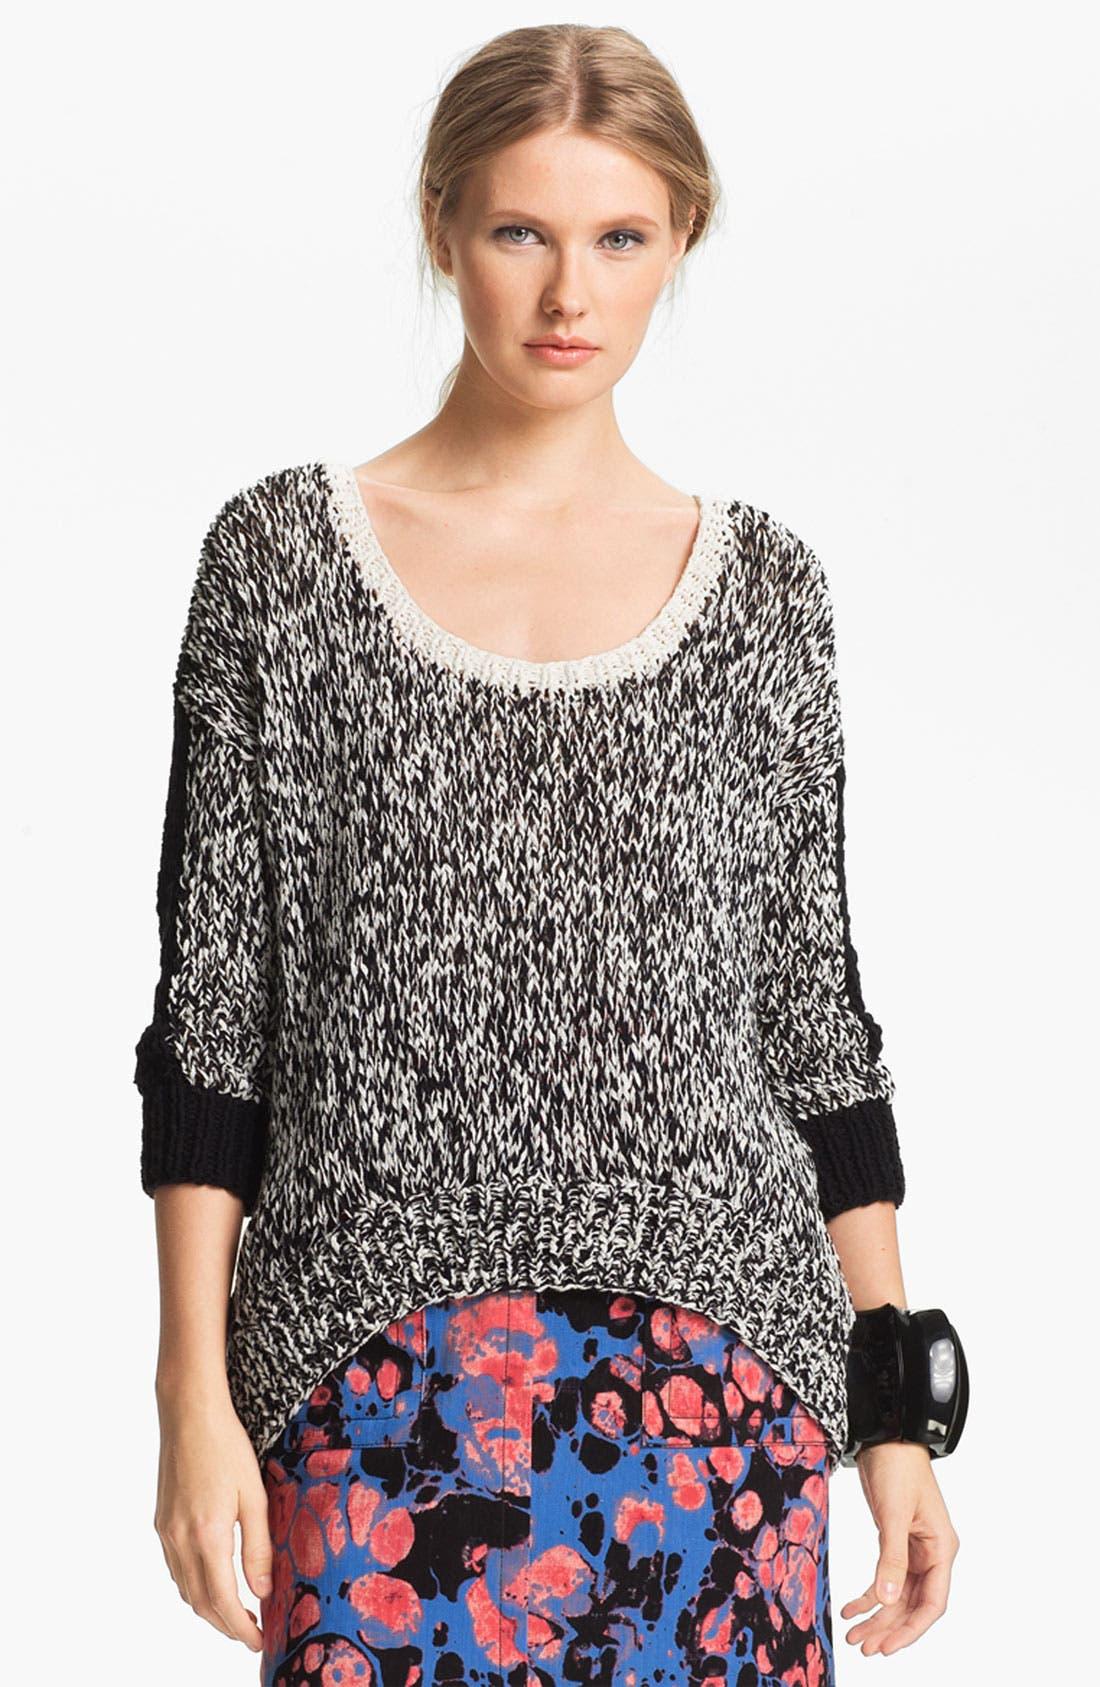 Alternate Image 1 Selected - Kelly Wearstler 'Sulfate' Sweater